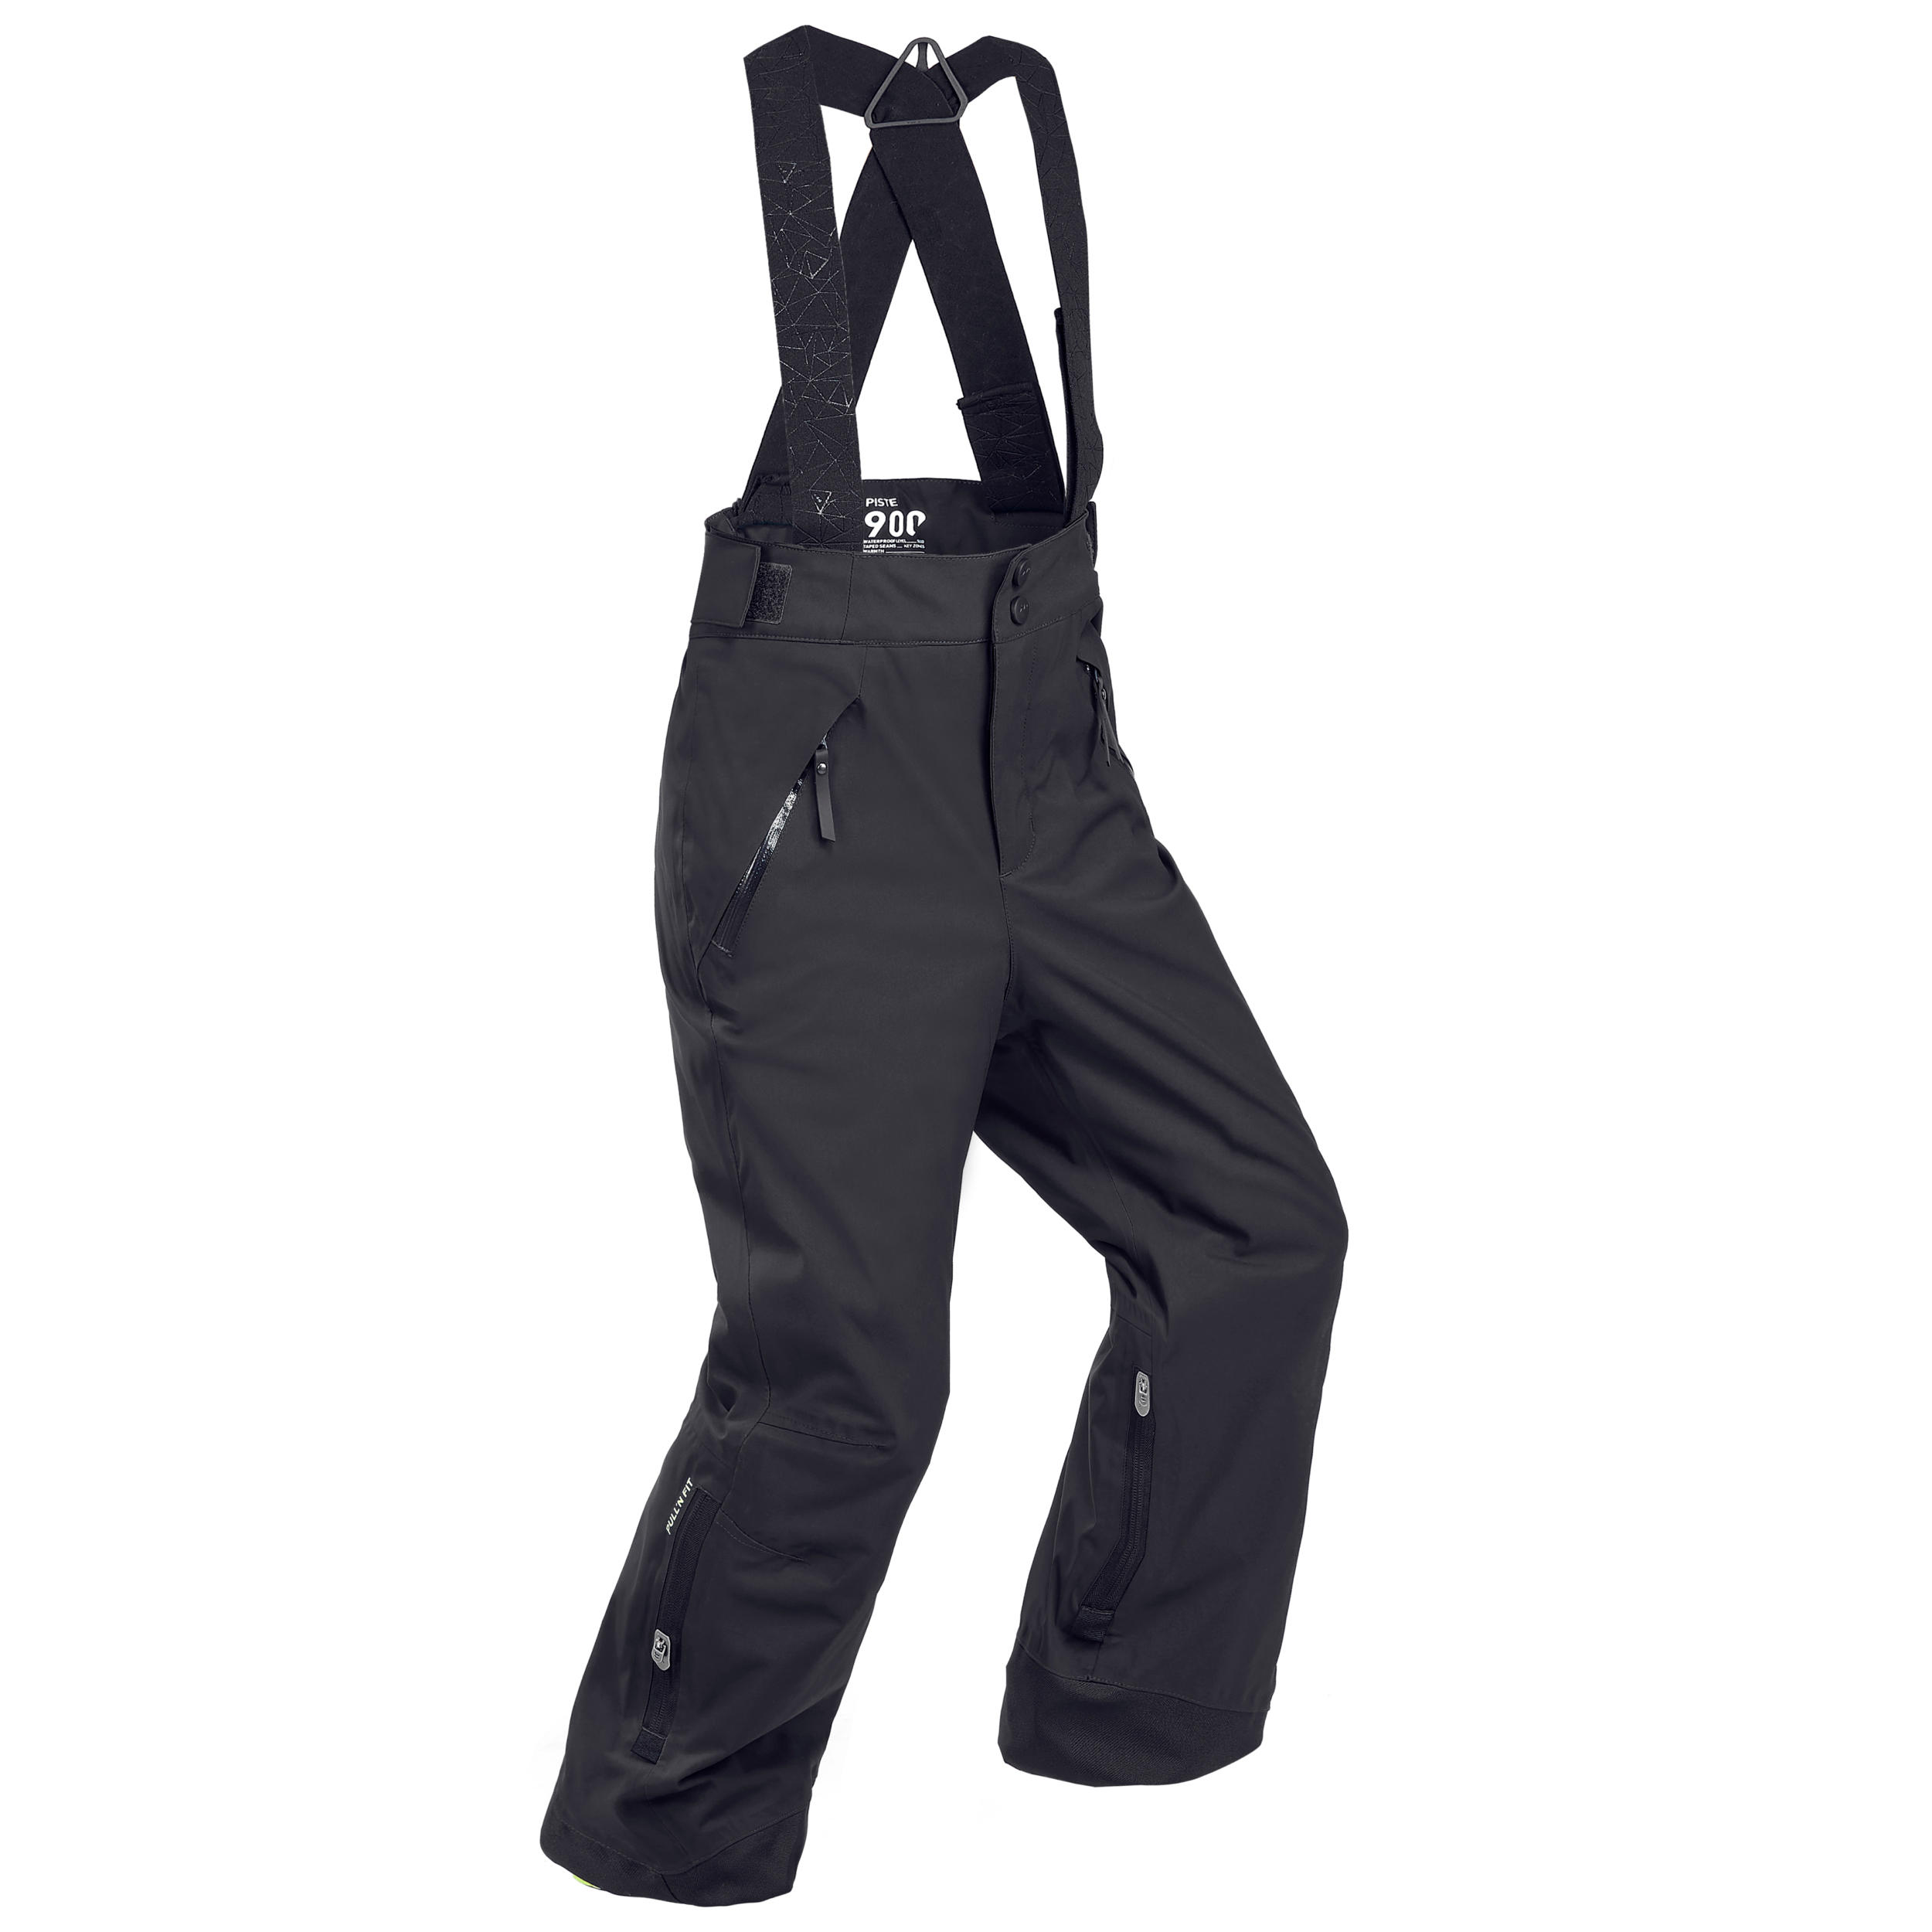 Pantalon schi PNF 900 imagine